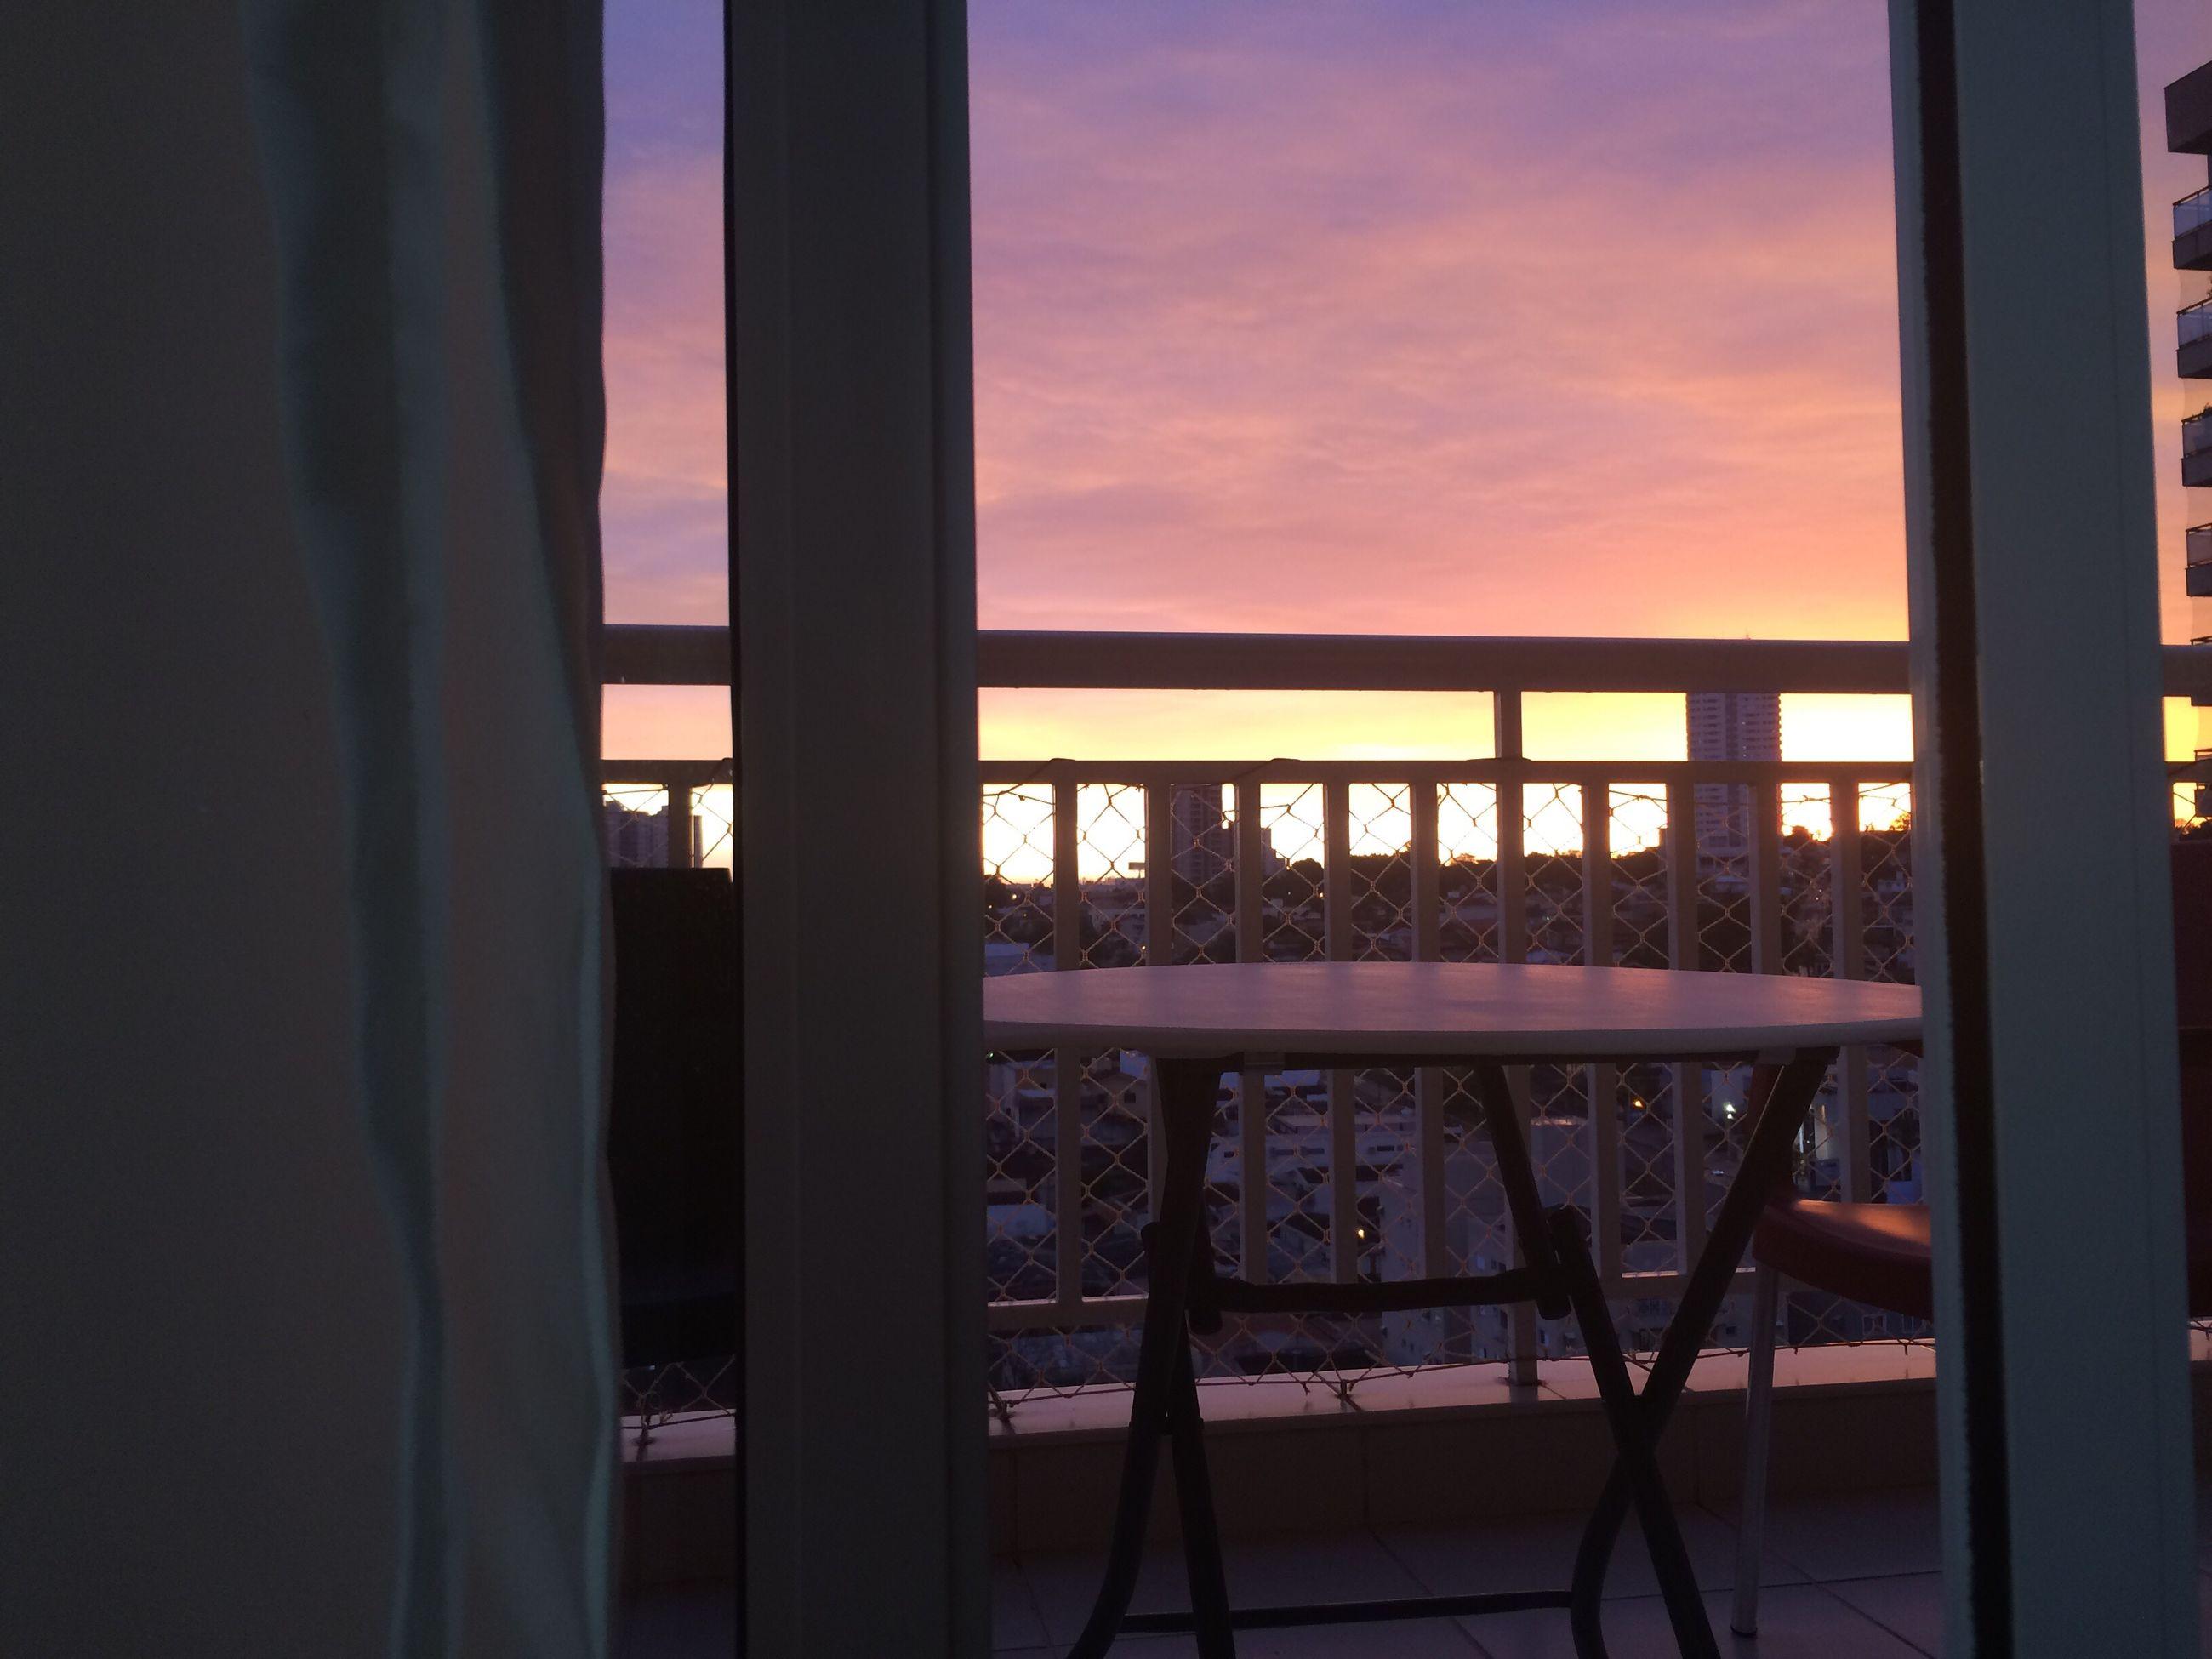 window, indoors, sunset, home interior, transparent, sky, glass - material, cloud, balcony, dark, cloud - sky, no people, window frame